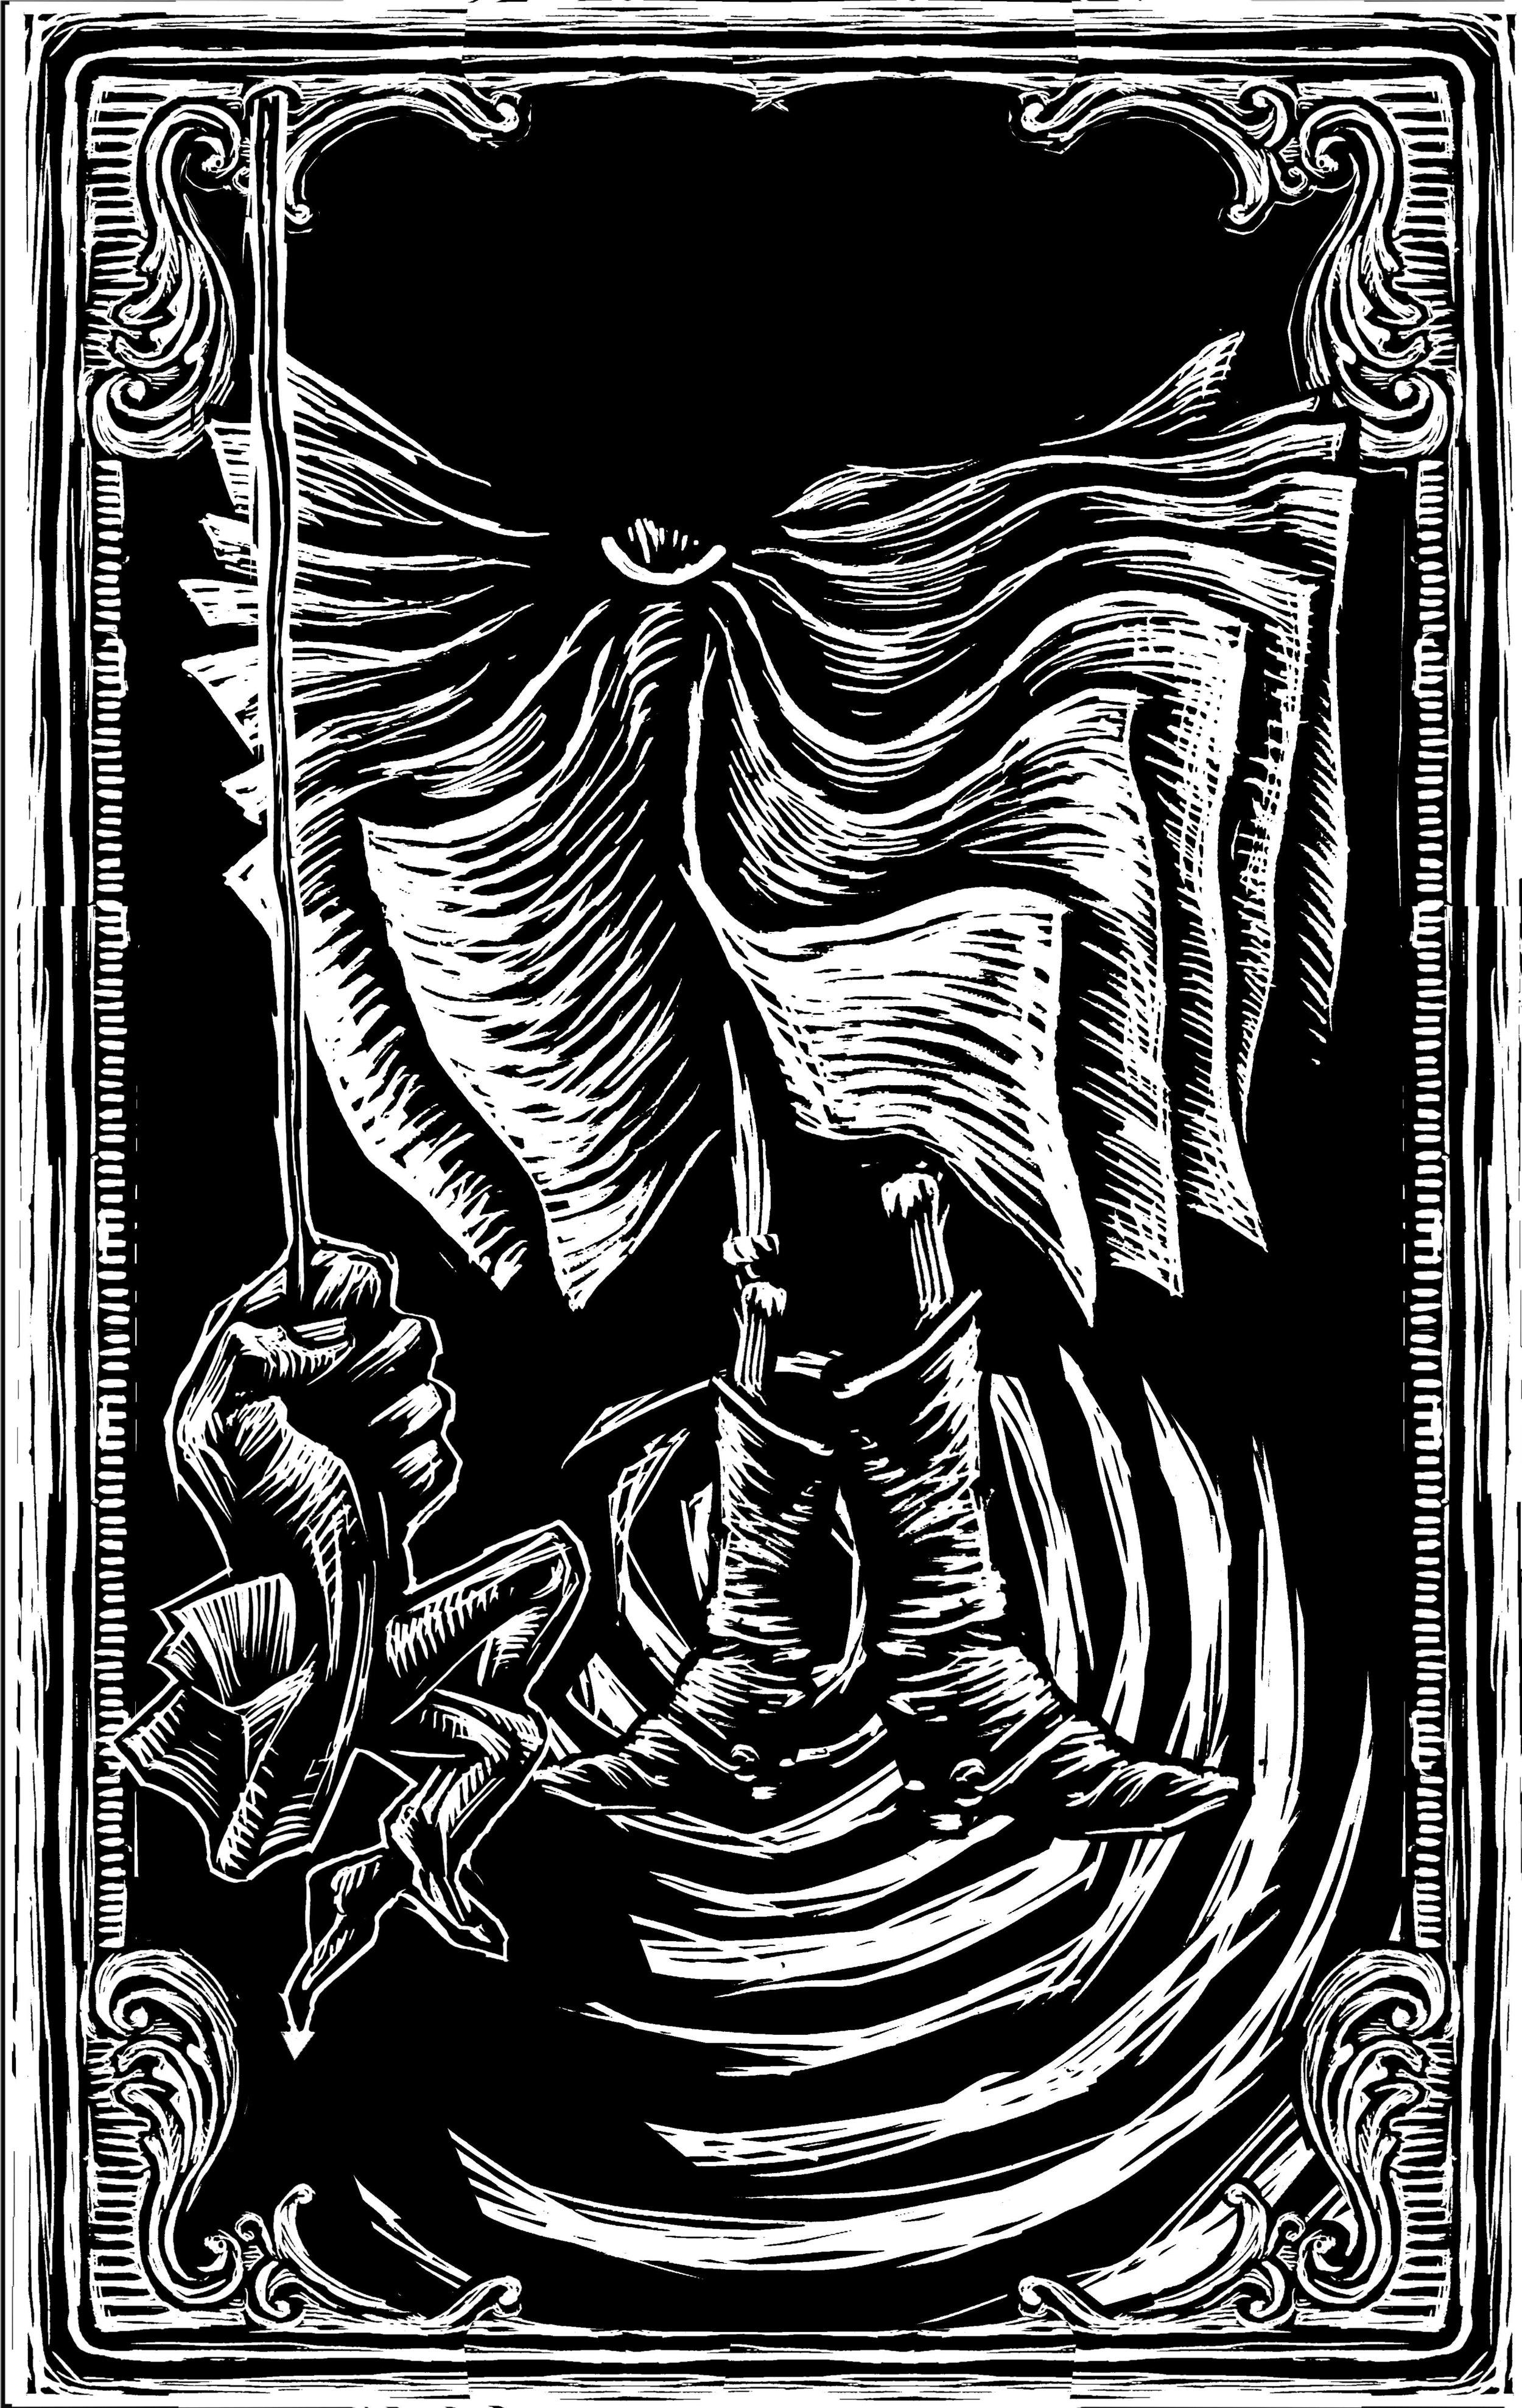 Don Quixote descends into Montesinos's cave